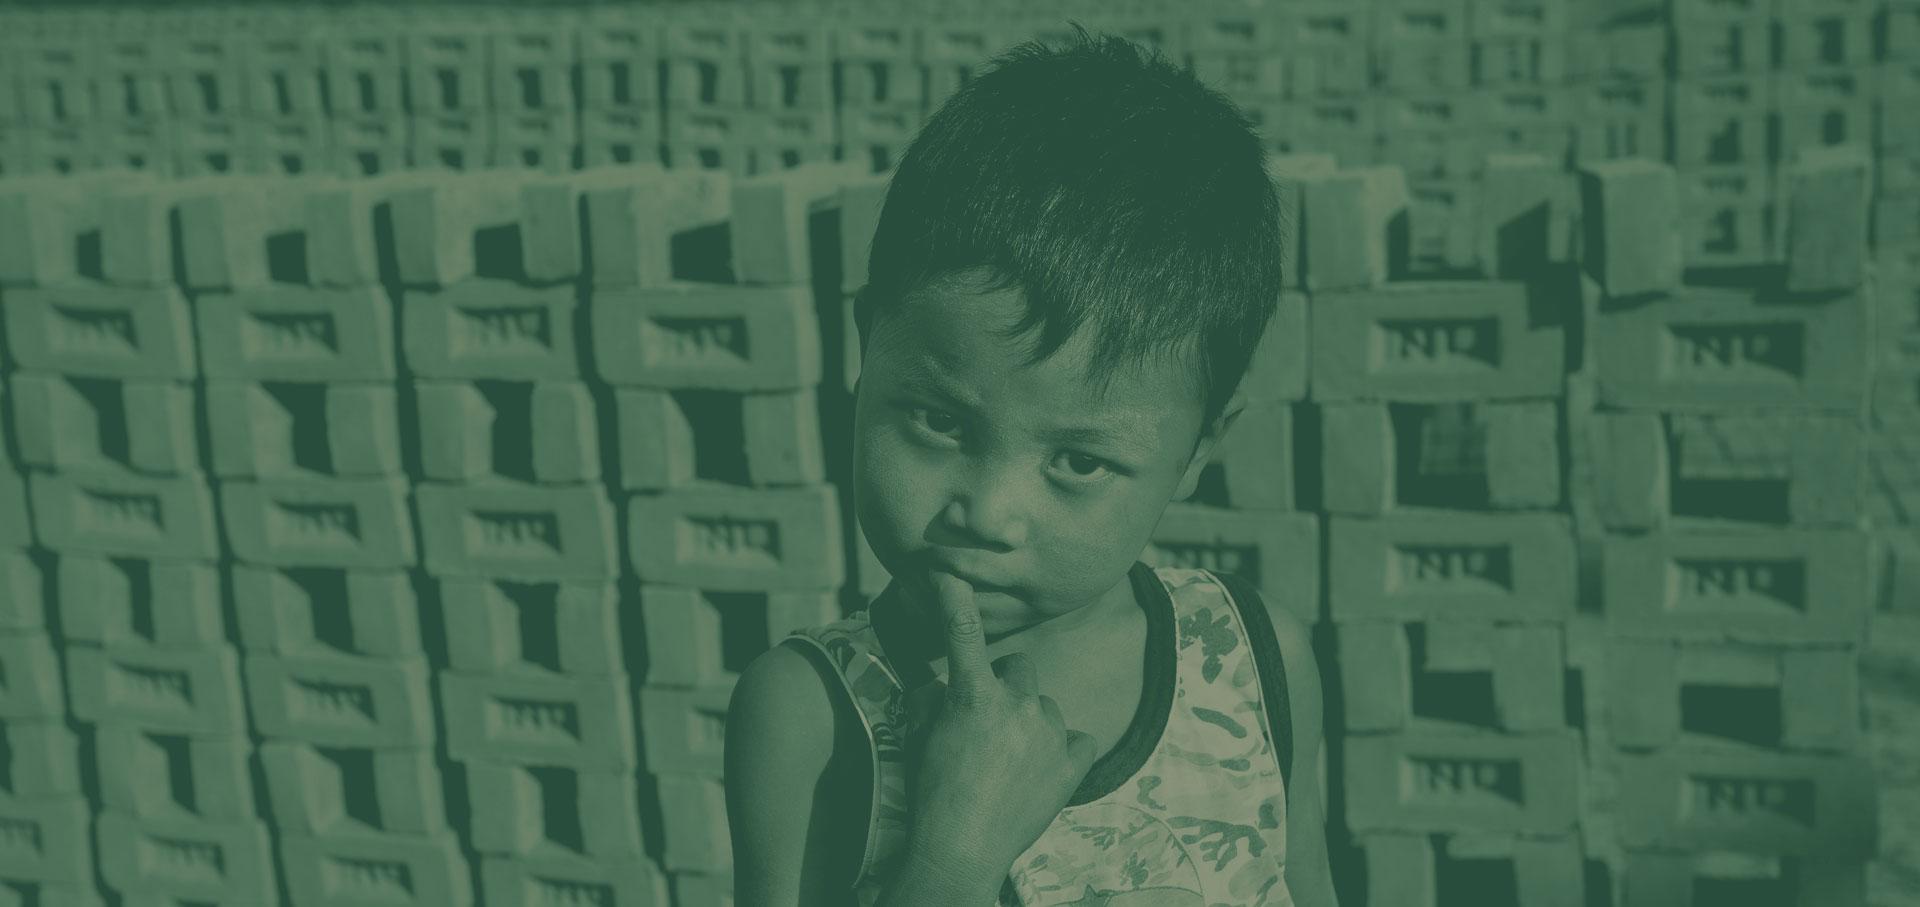 Adil: a stolen childhood